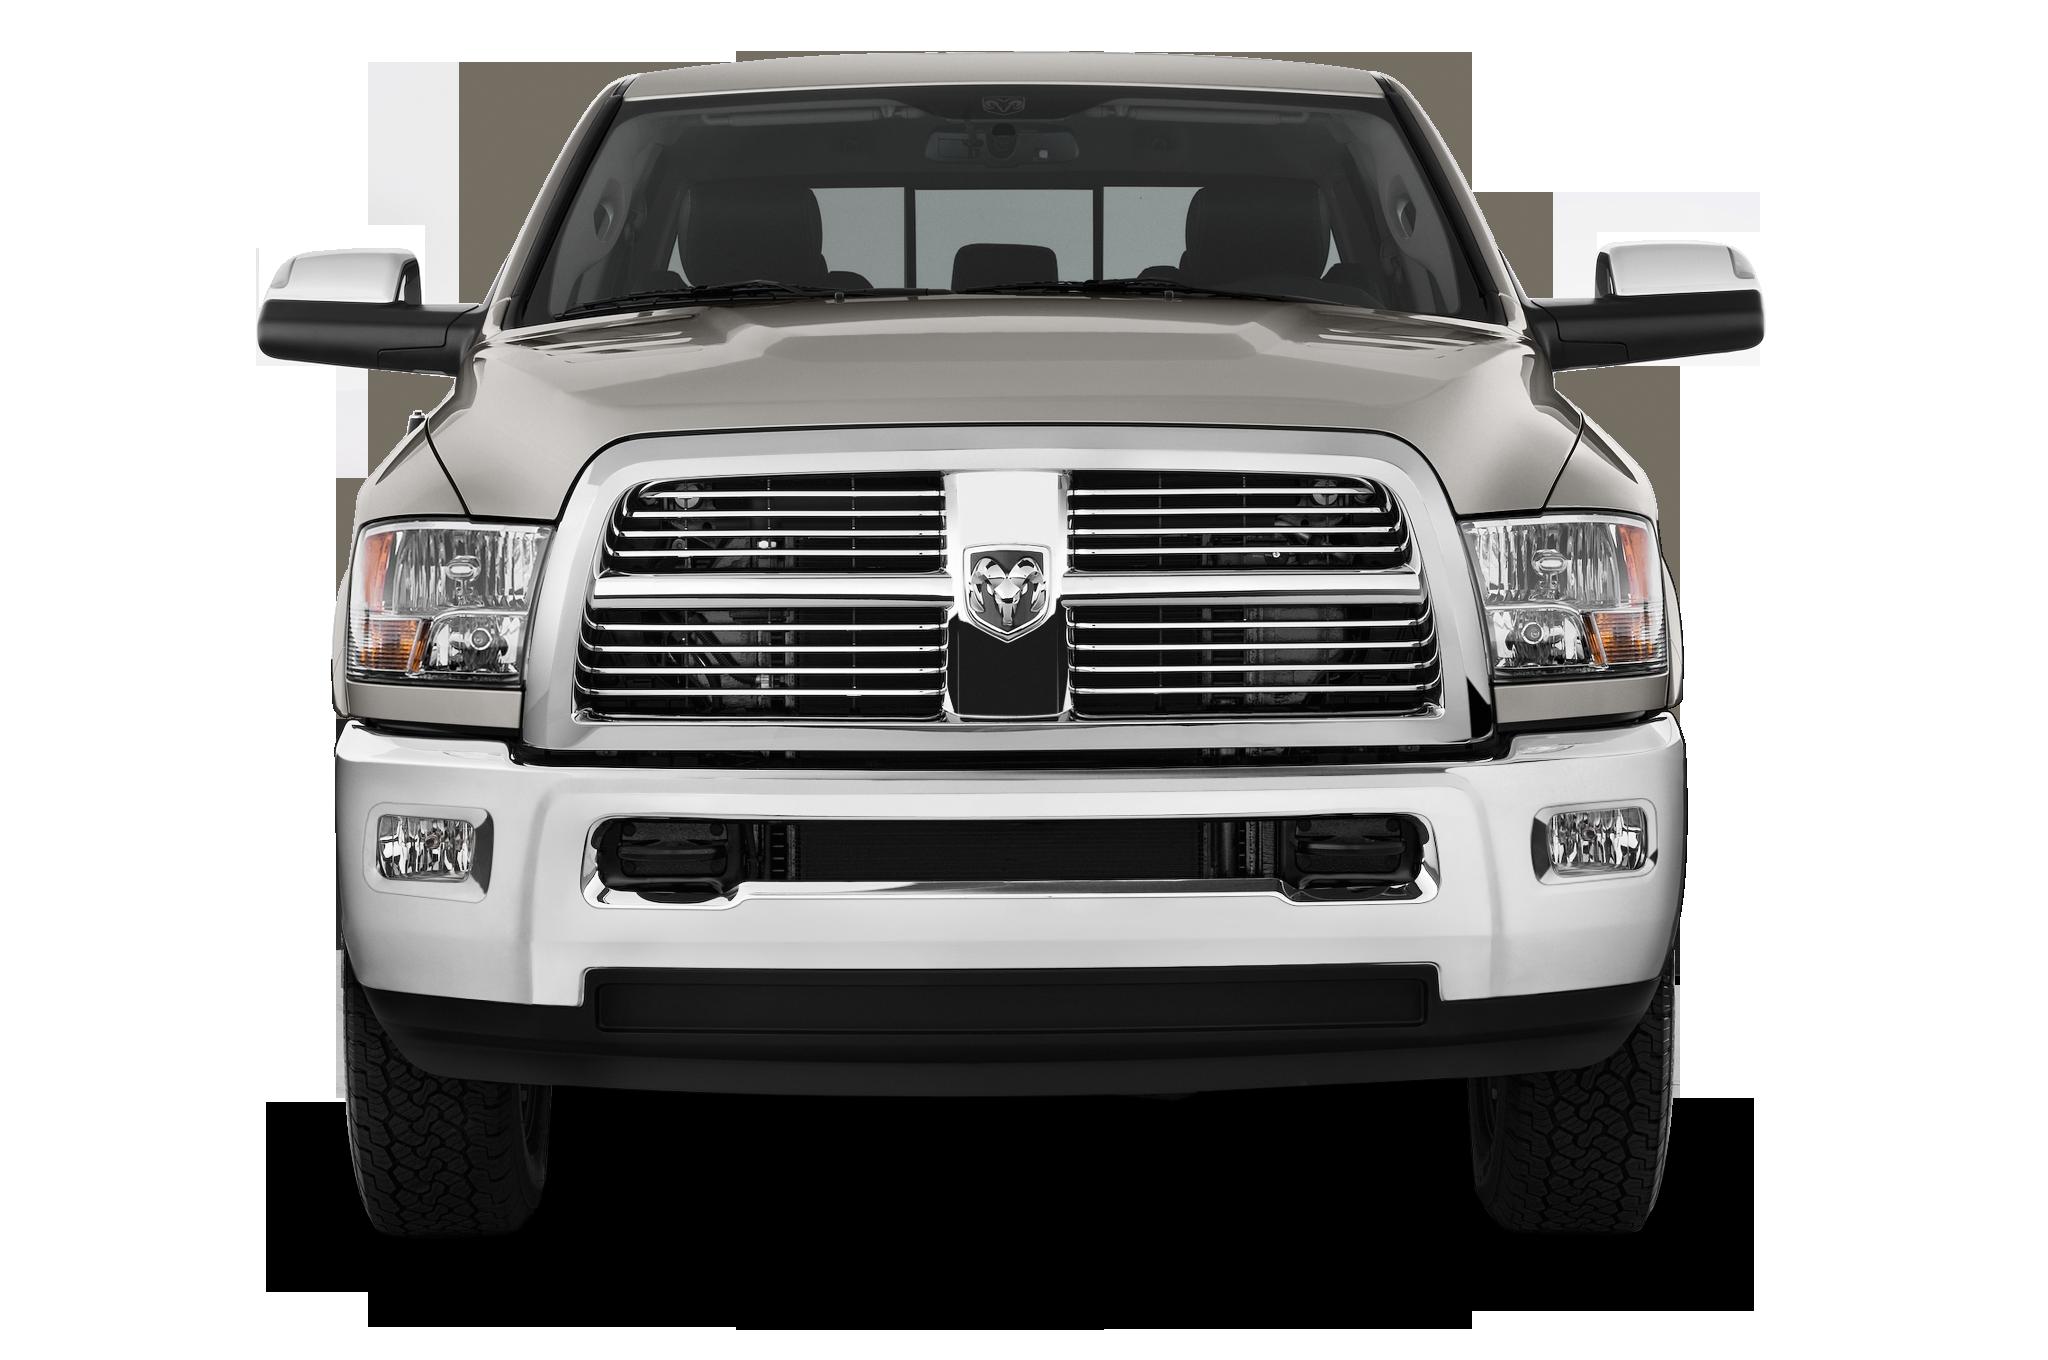 2010 dodge ram power wagon crew cab 4x4 editor 39 s notebook automobile magazine. Black Bedroom Furniture Sets. Home Design Ideas